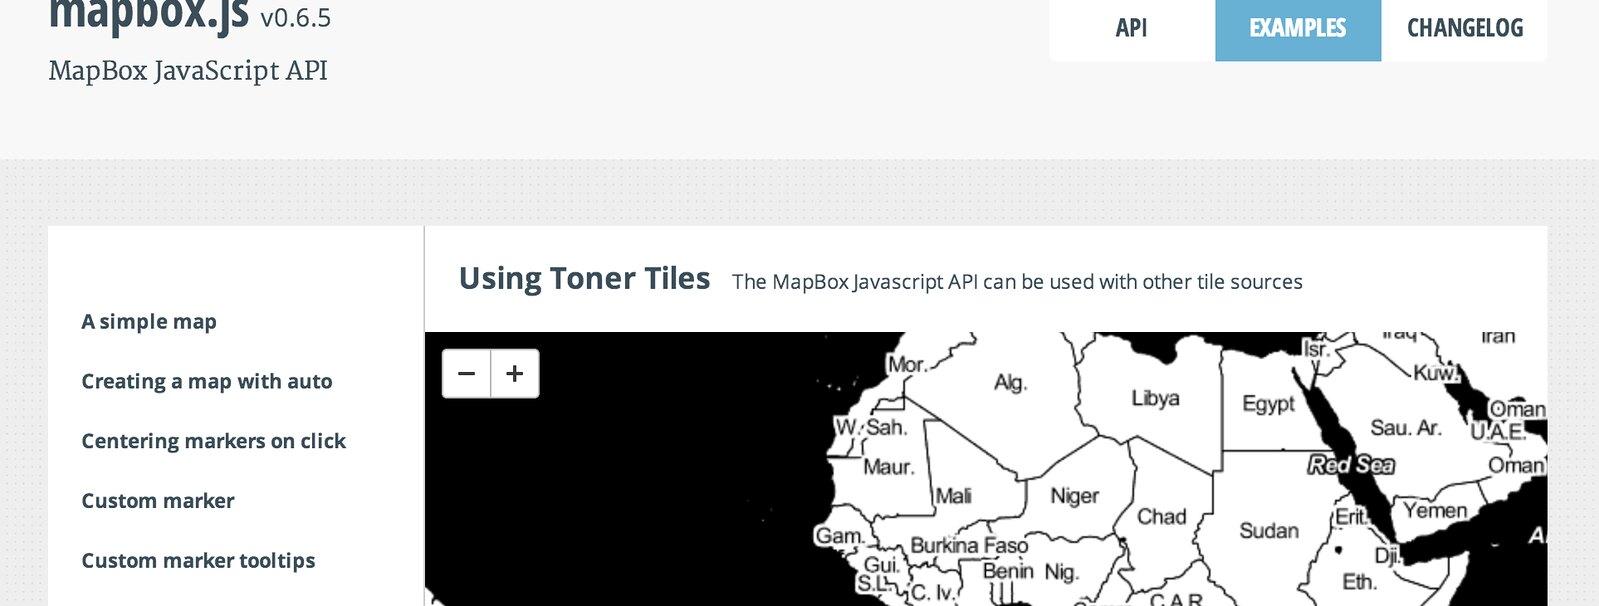 MapBox With Stamen Toner Tiles